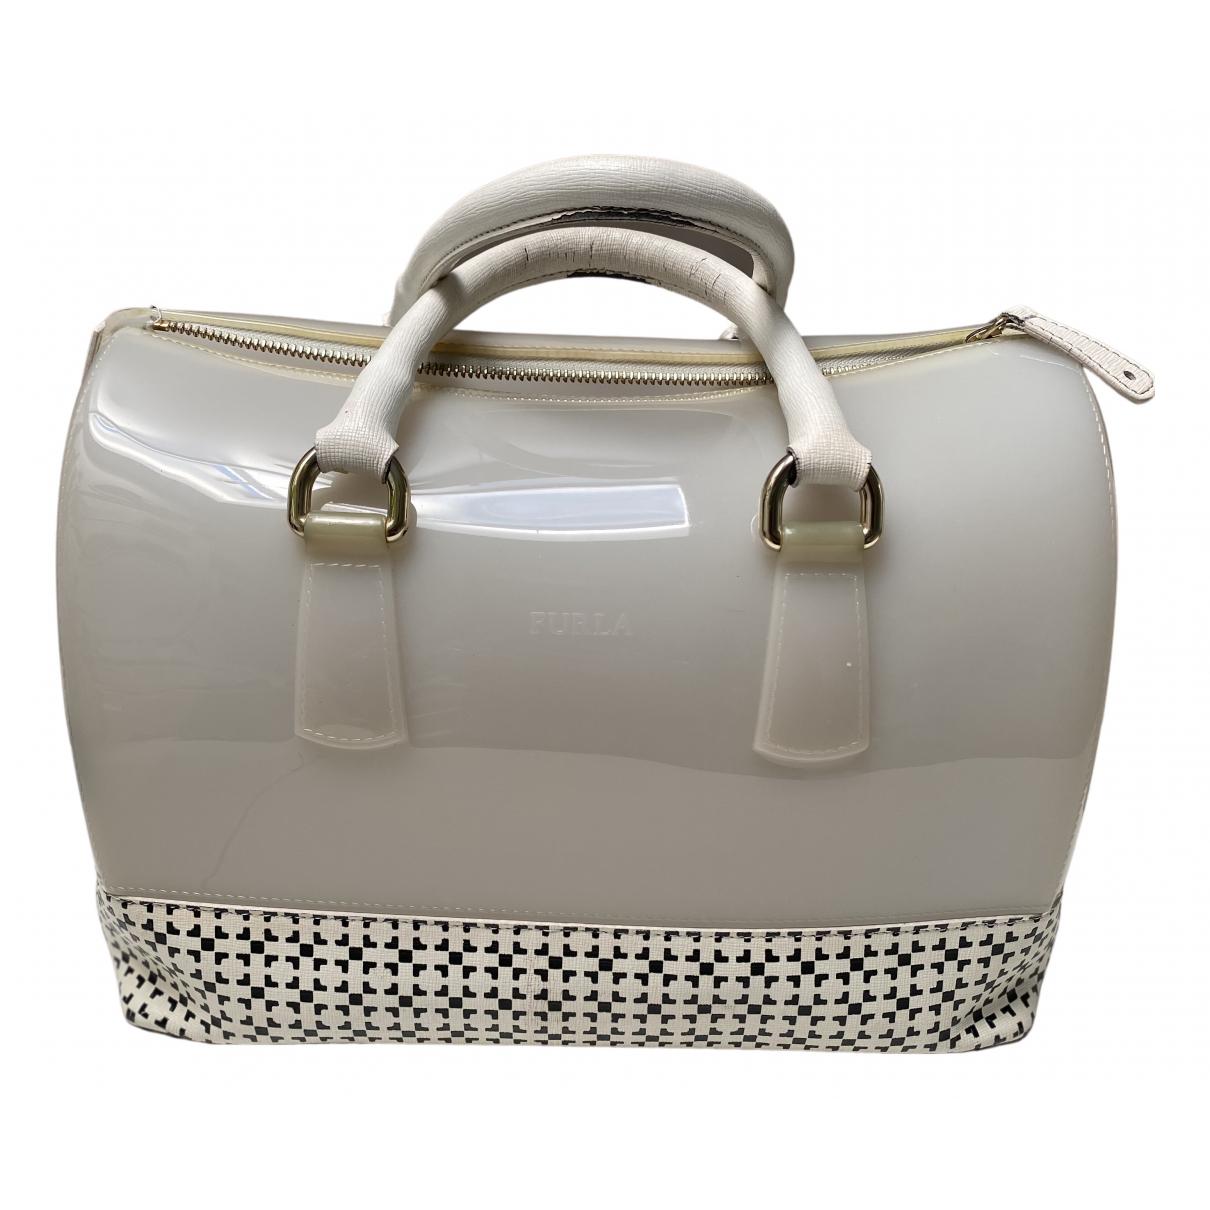 Furla Candy Bag Ecru handbag for Women N